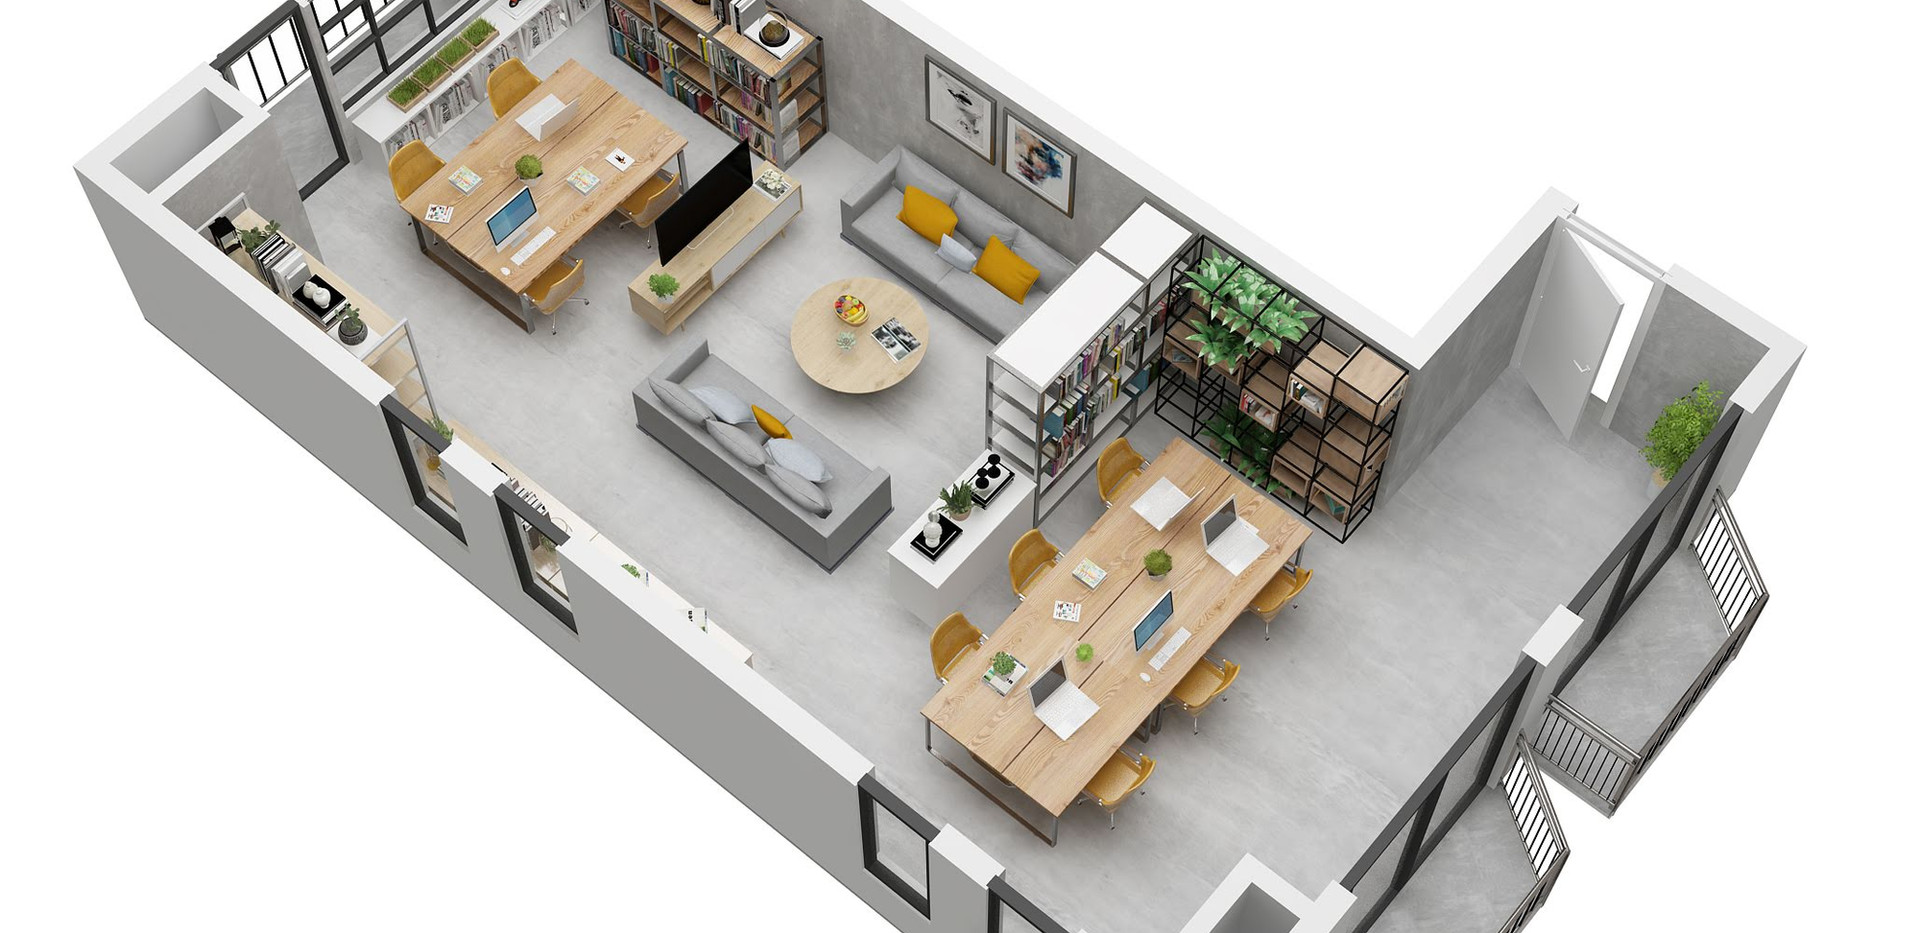 rubyykleung_perpective_3D pro floor plan office